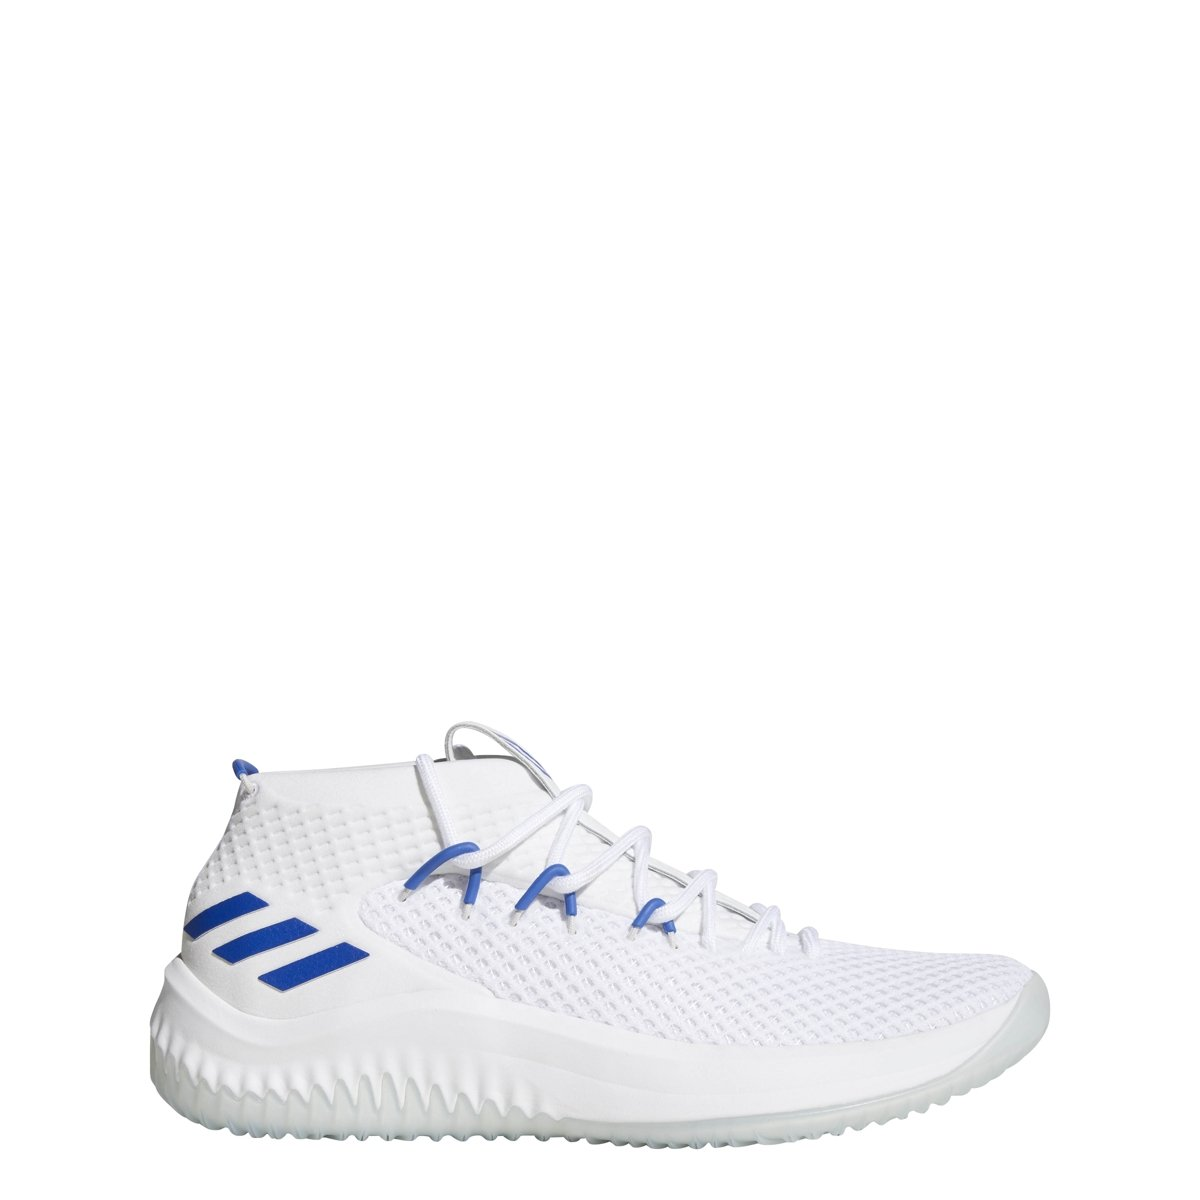 chaussure de basket adidas dame 4 hommes b0795cf4pw 13 d (m) usblanc bleu